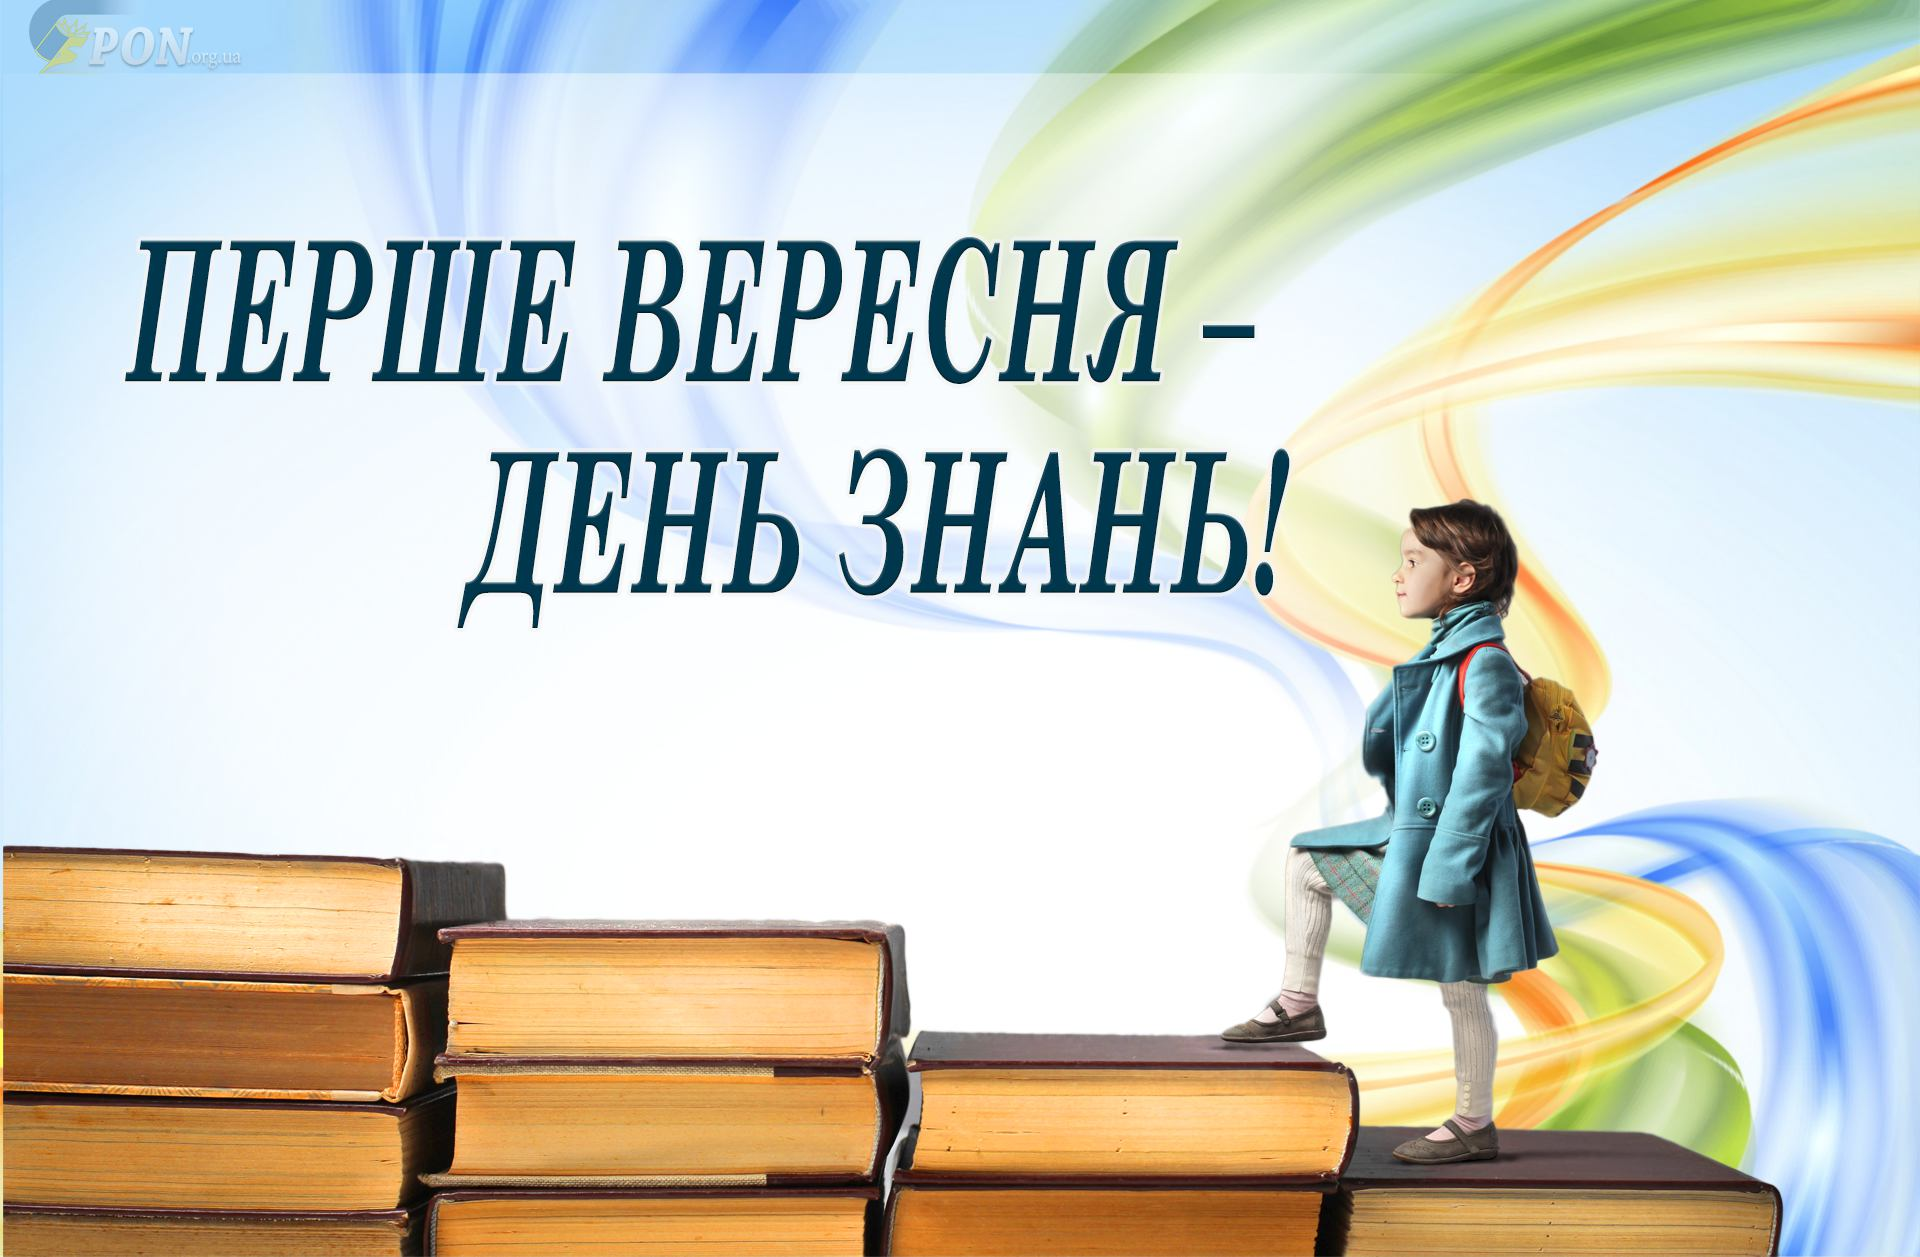 https://pon.org.ua/uploads/posts/2017-08/1504161995_den-znan-2017-sayt.jpg